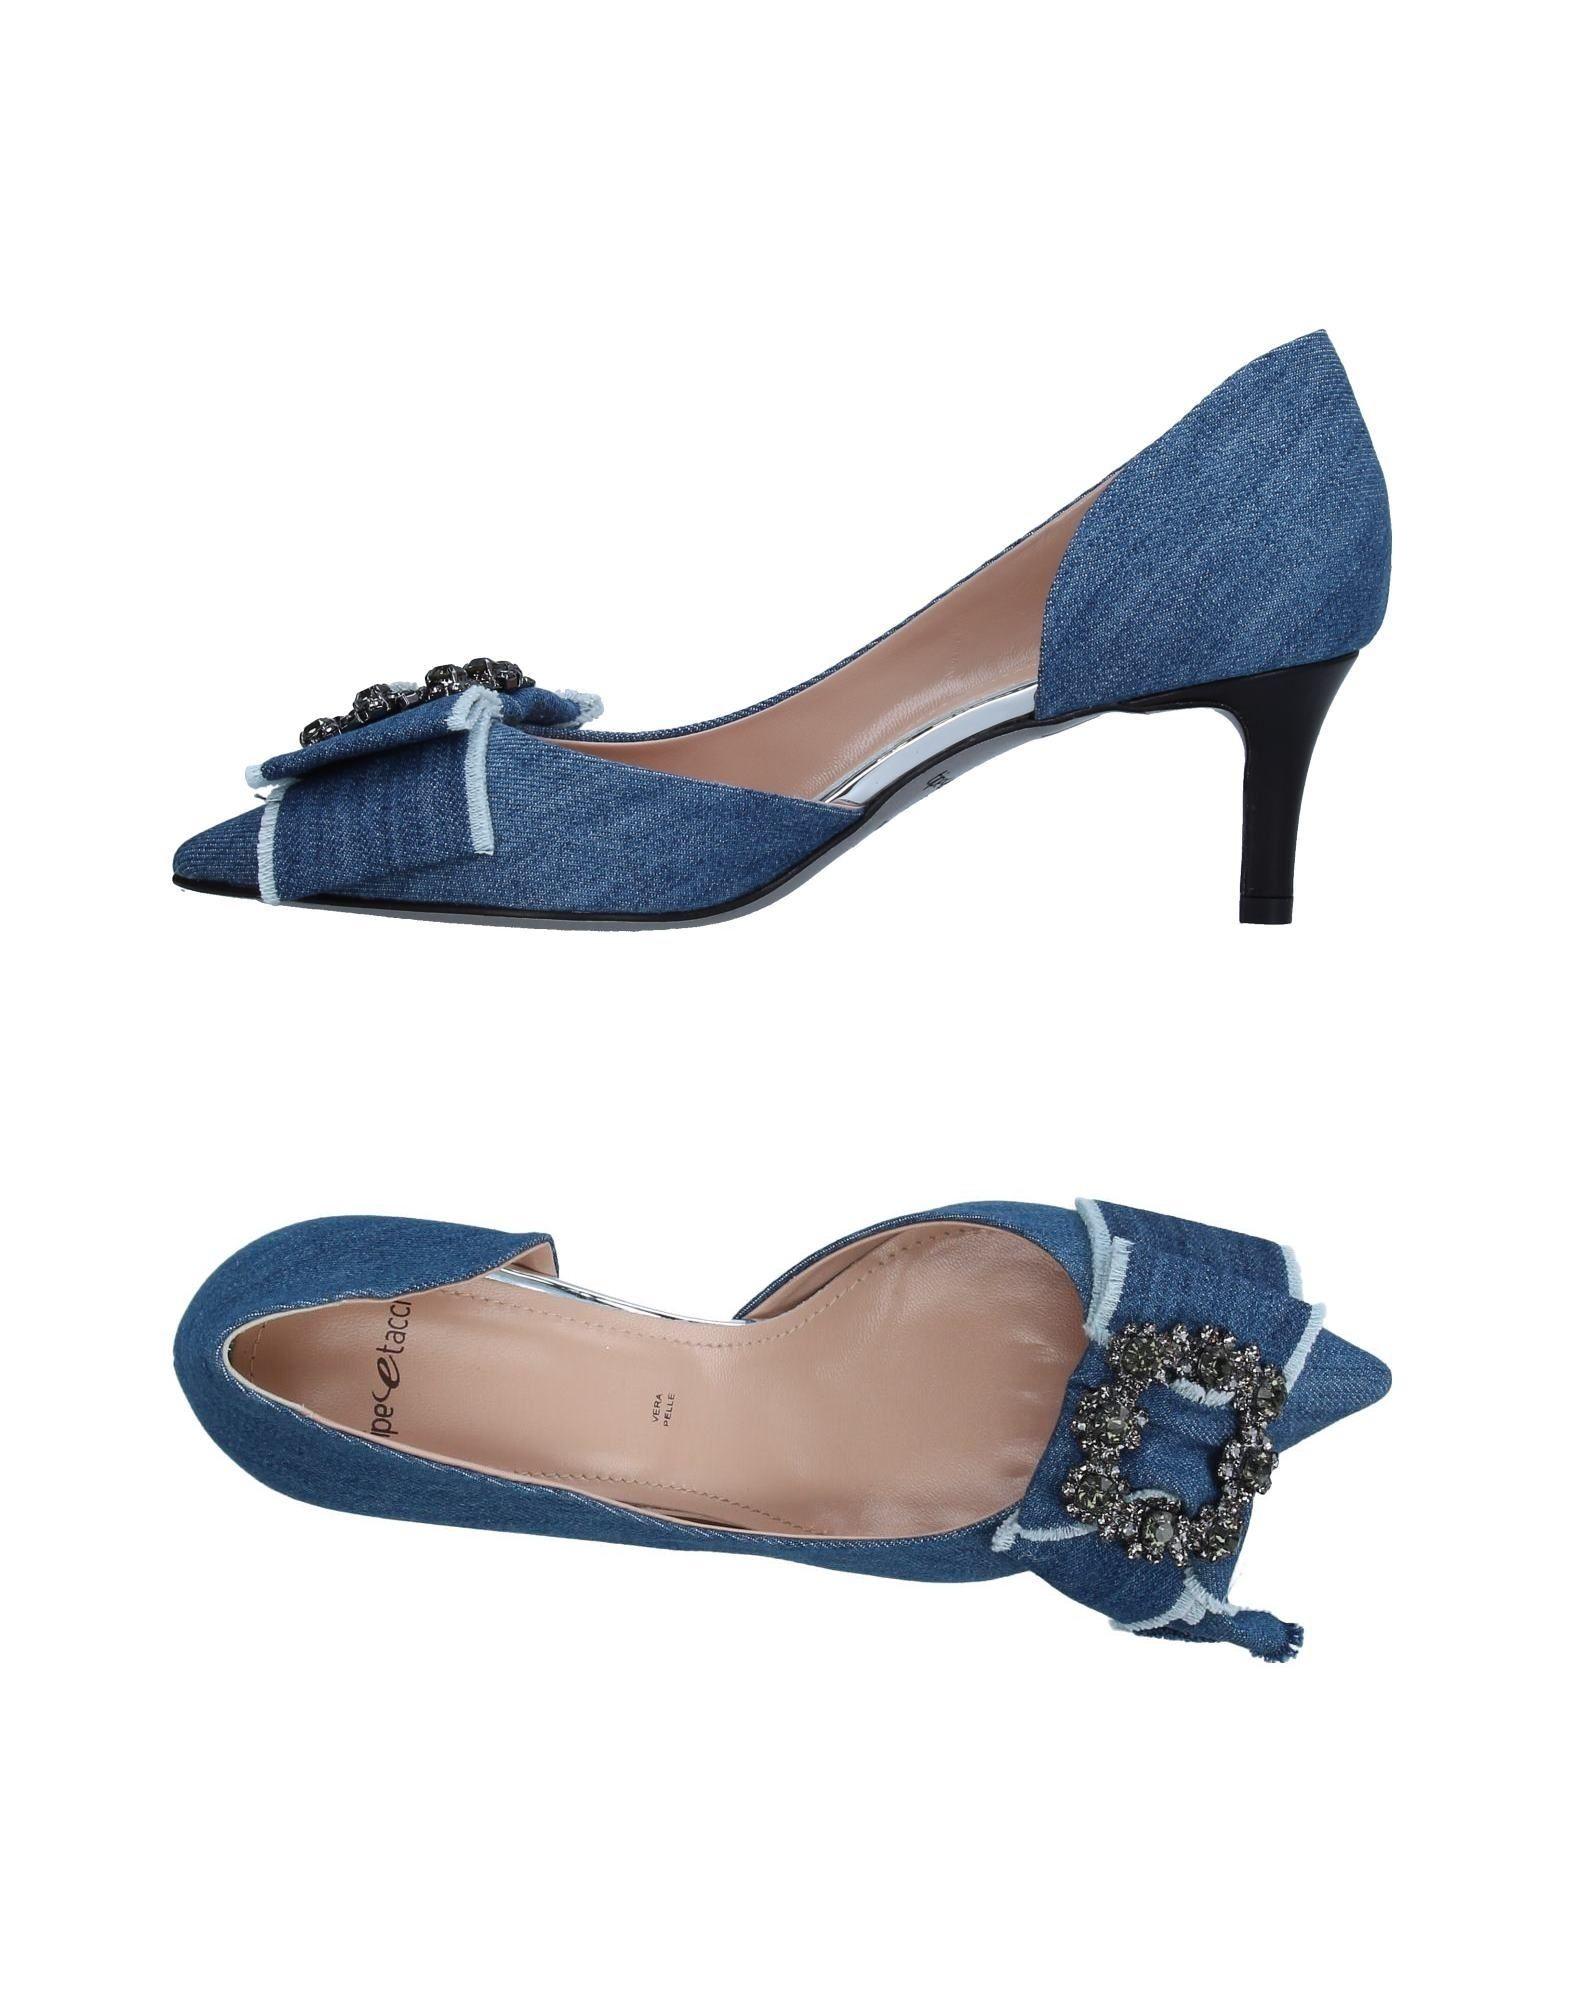 TIPE E TACCHI Damen Pumps Farbe Blau Größe 9 jetztbilligerkaufen